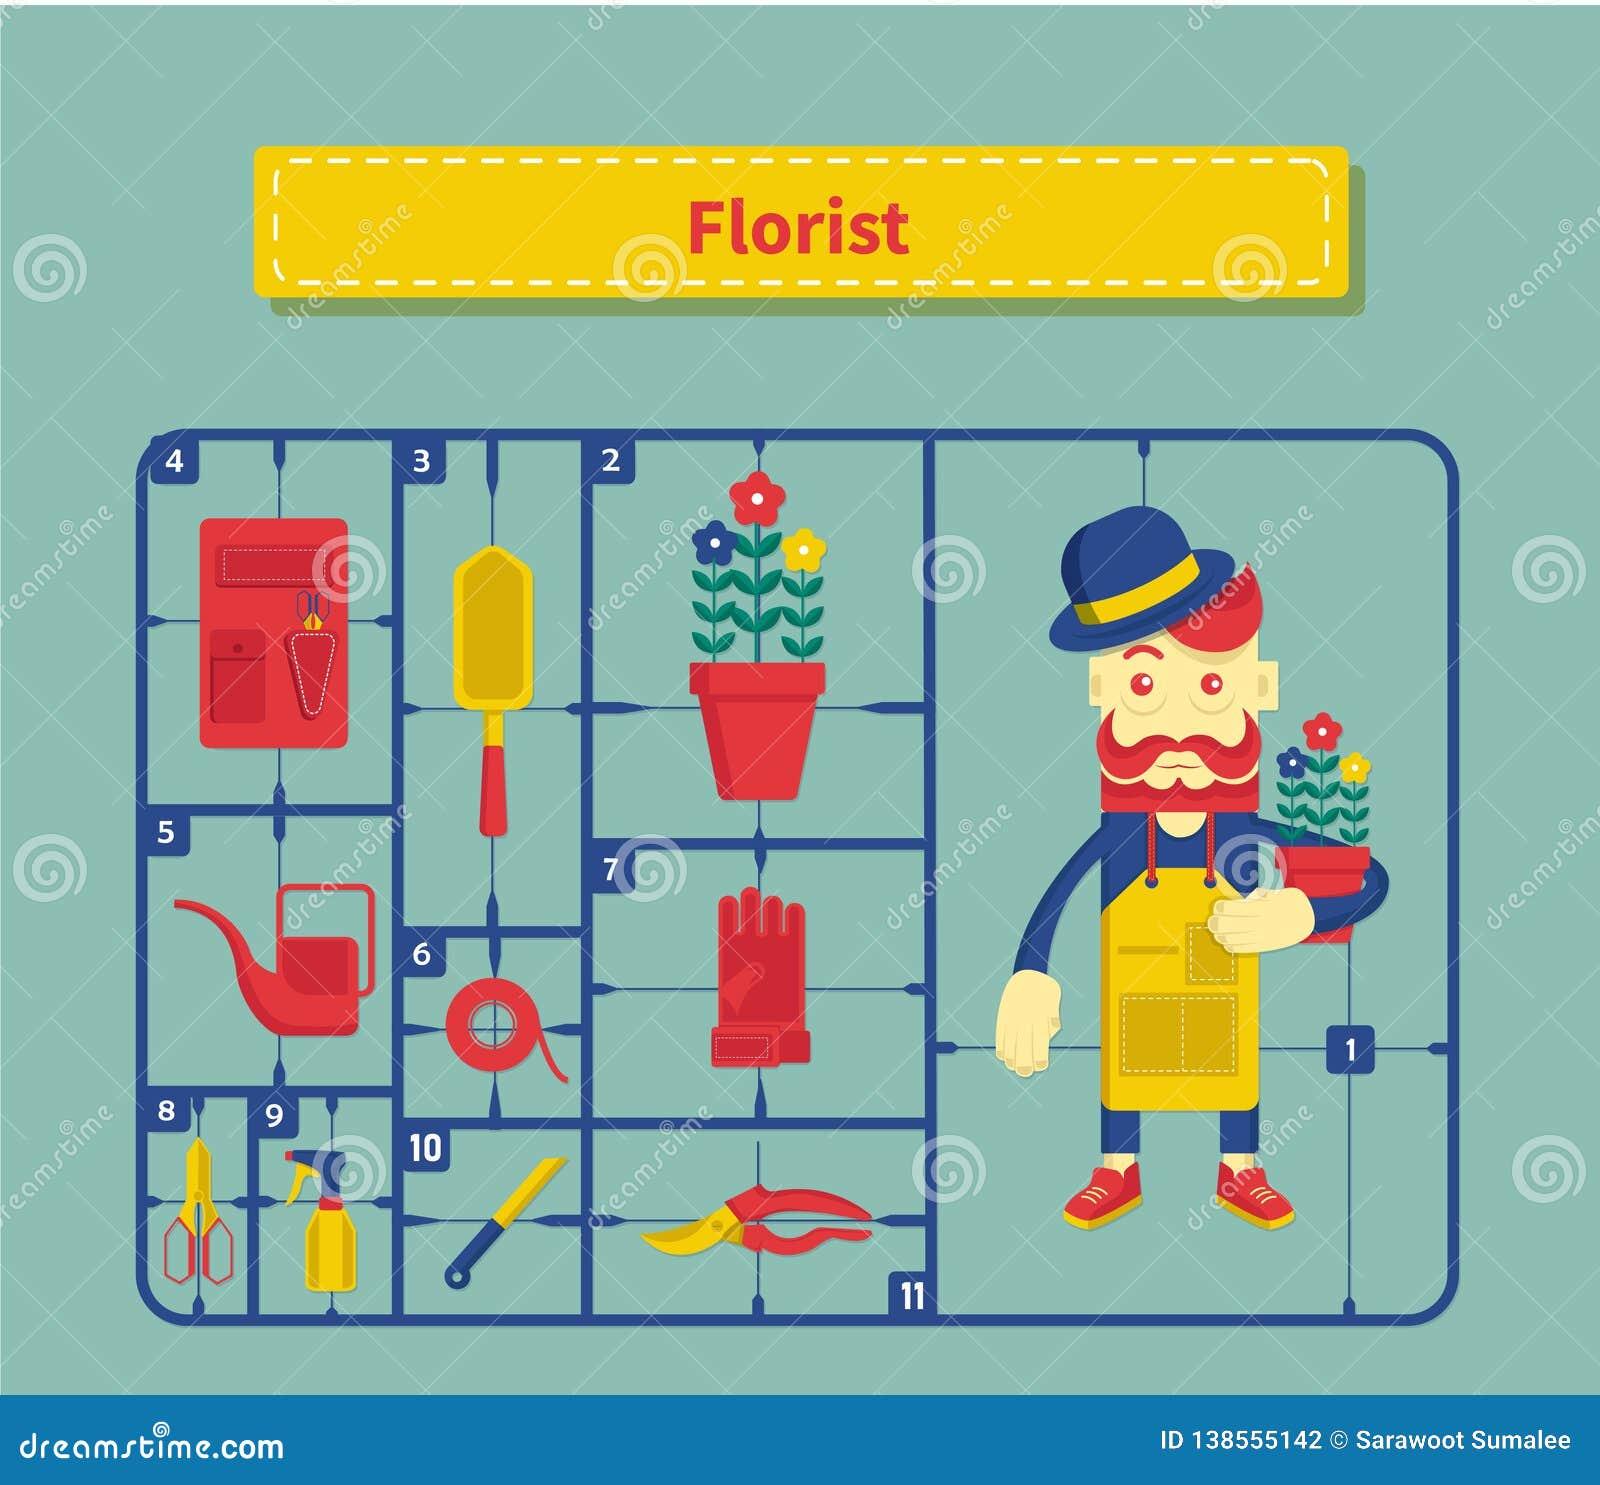 Konzeptkarikatur der Weinleseart von Charakter Floristen